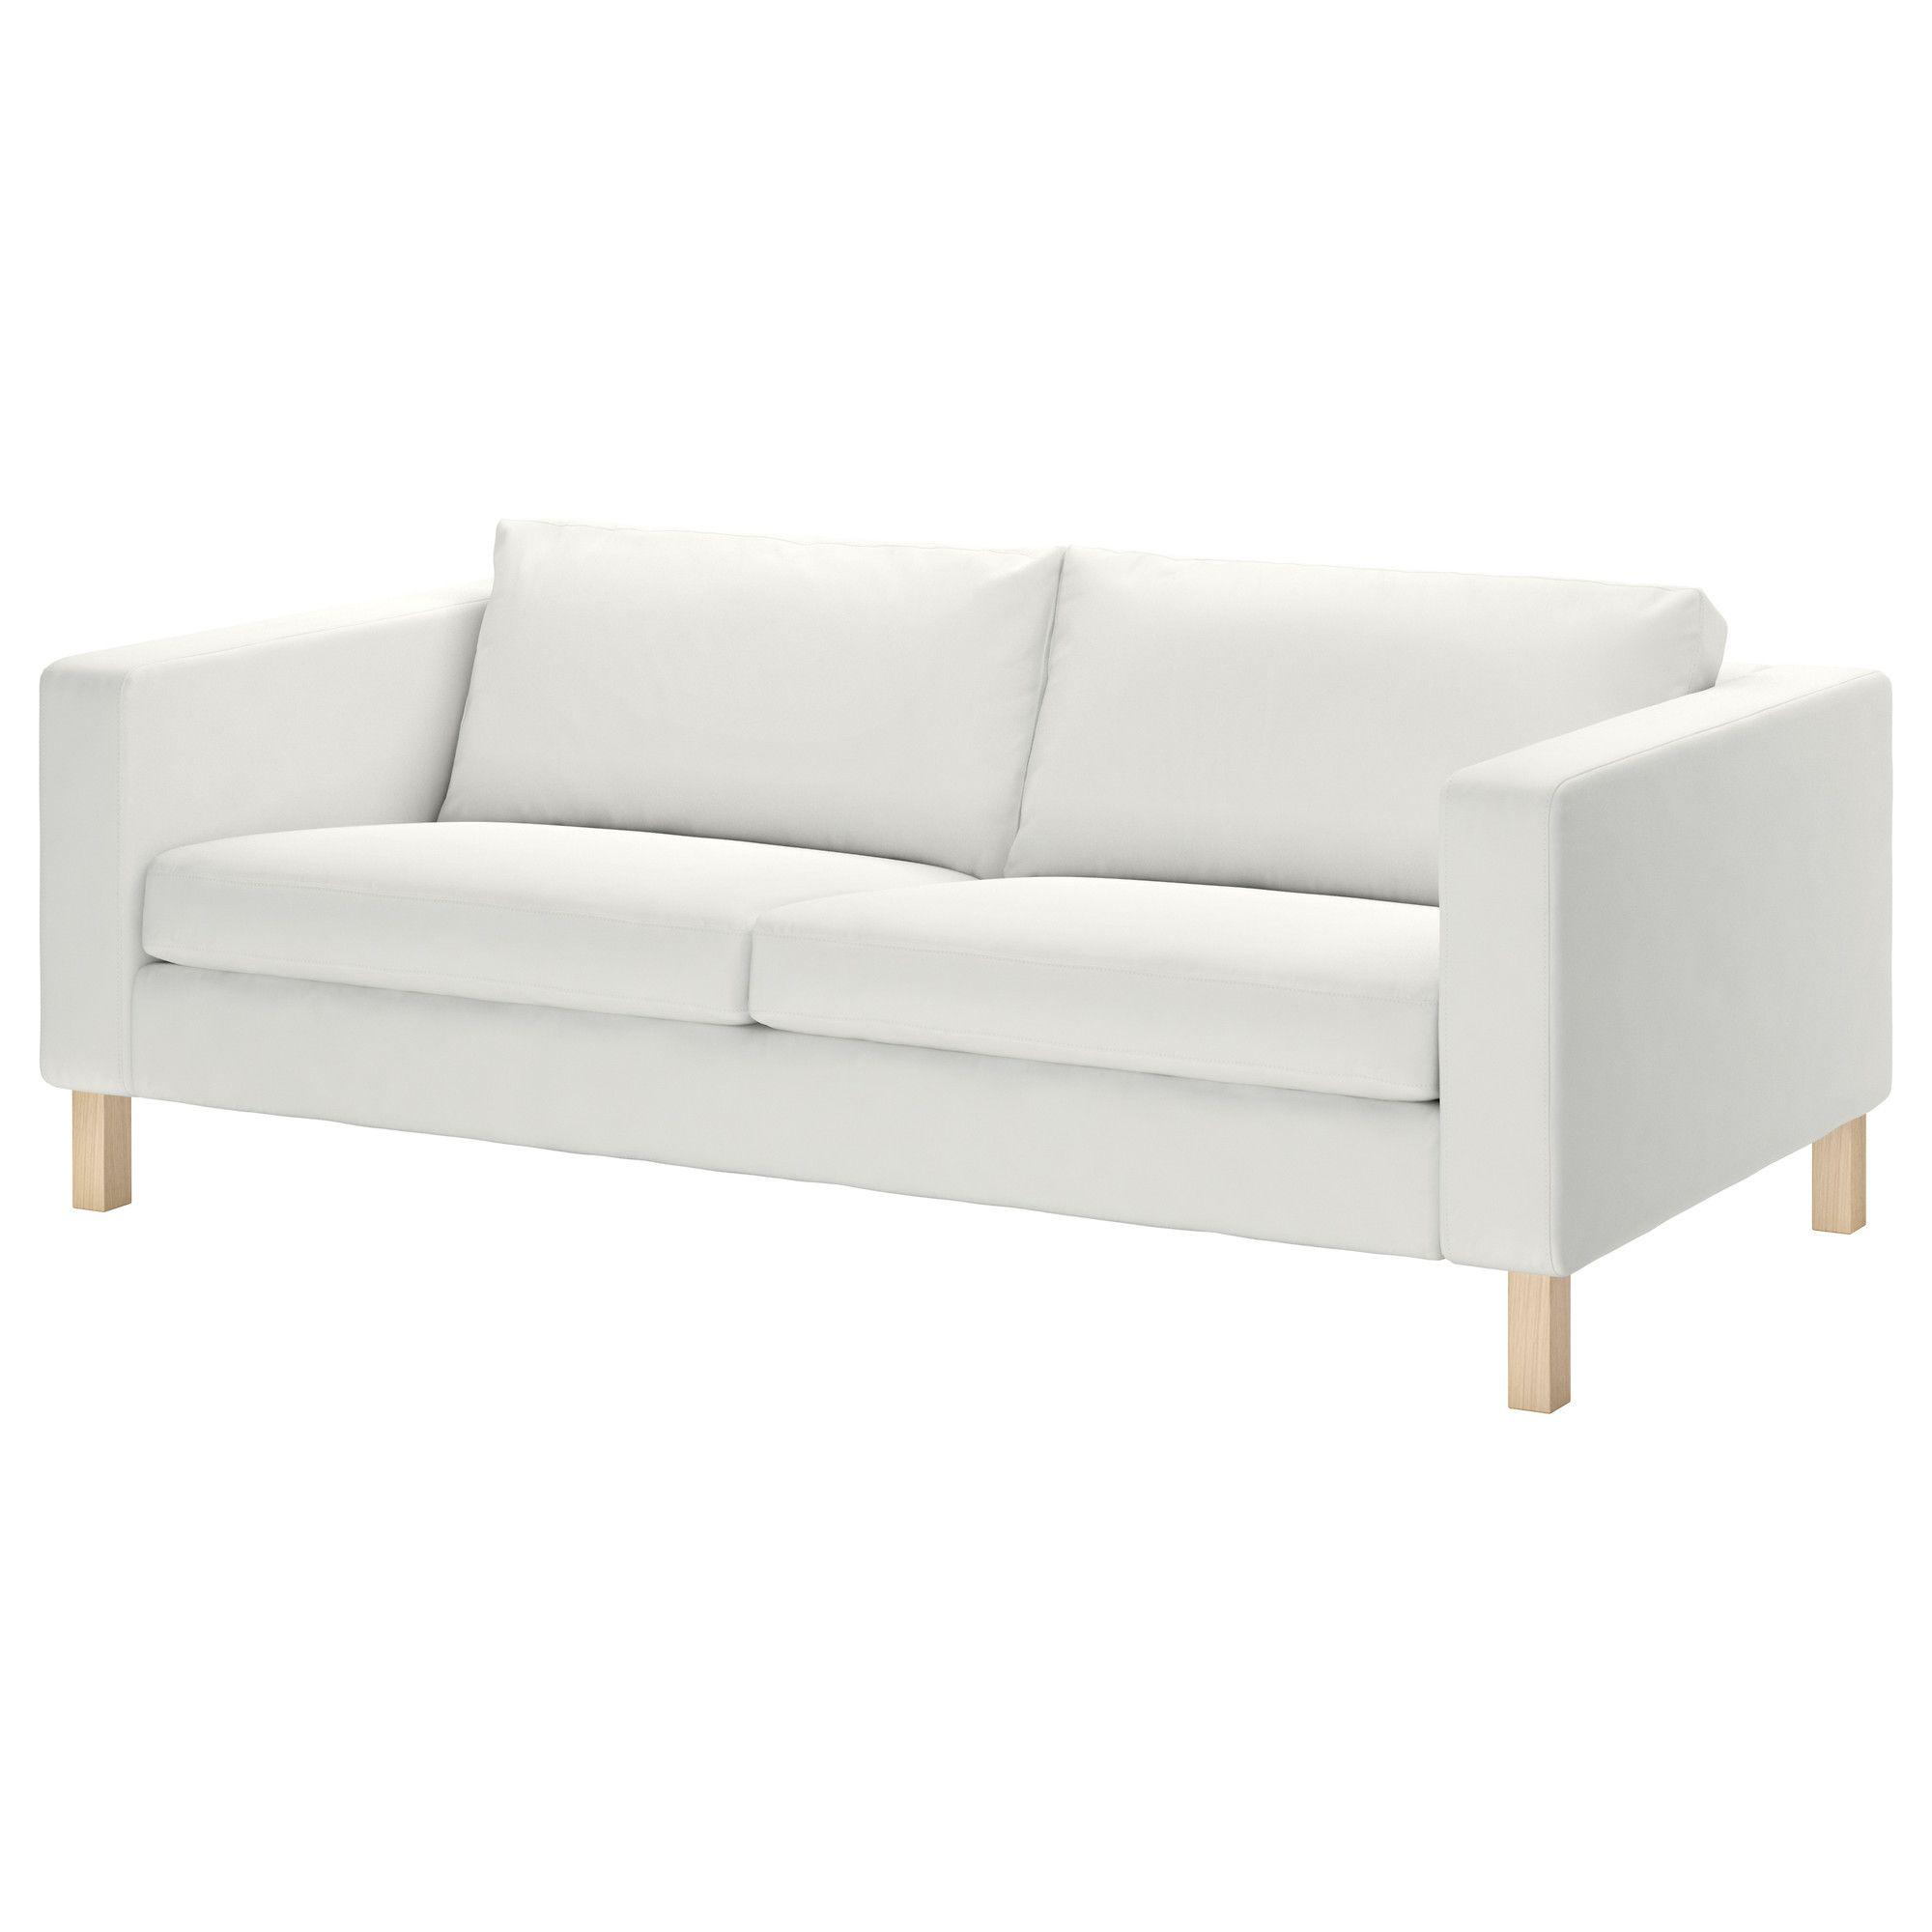 karlstad sofa blekinge white storage covers ikea interior design